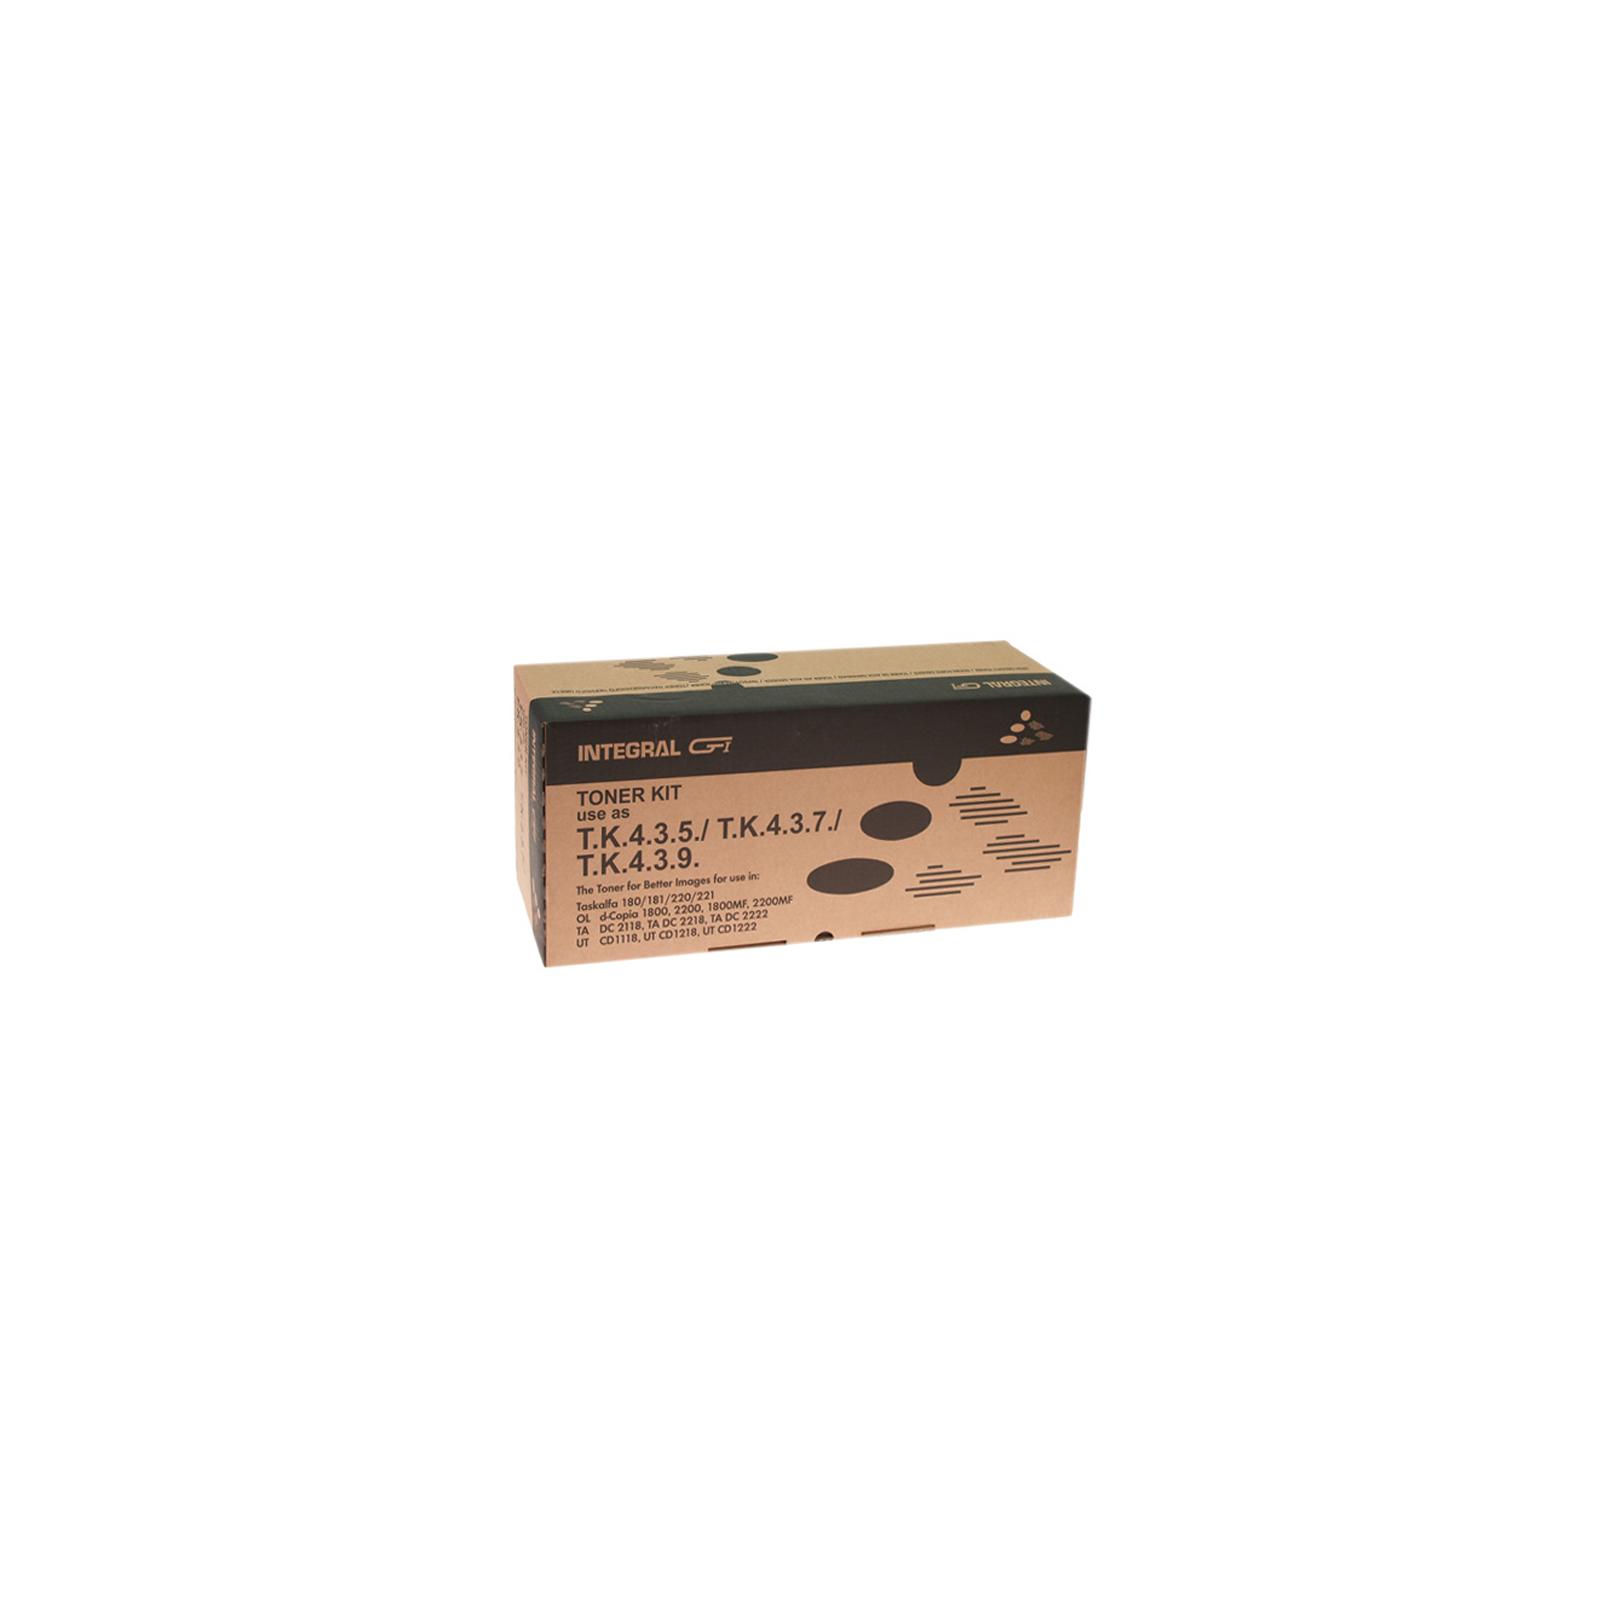 Тонер Kyocera TK-435 (туба 800г) Integral (12100040)